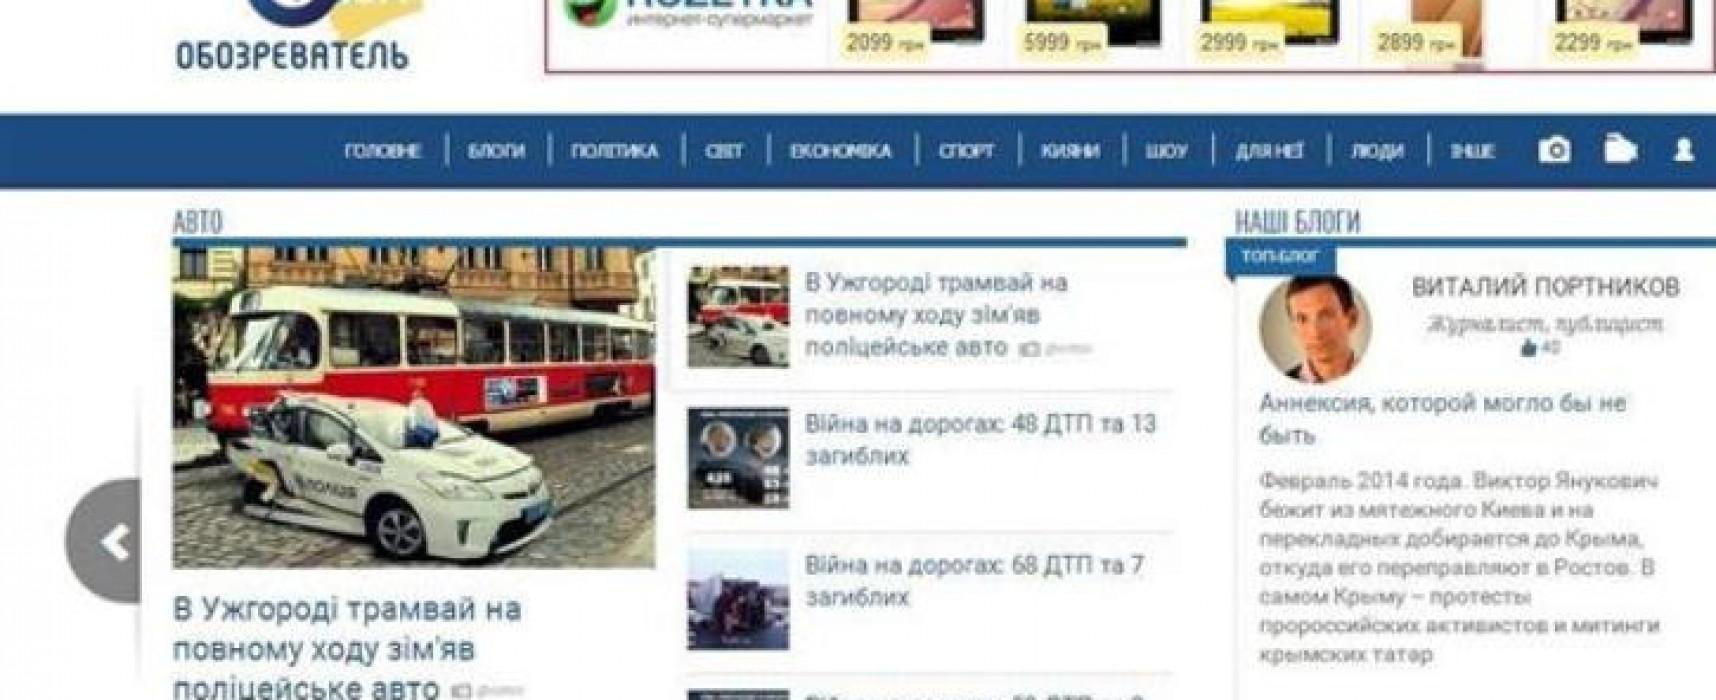 Ukrainian Media Spread Fake Uzhhorod Police Accident Story